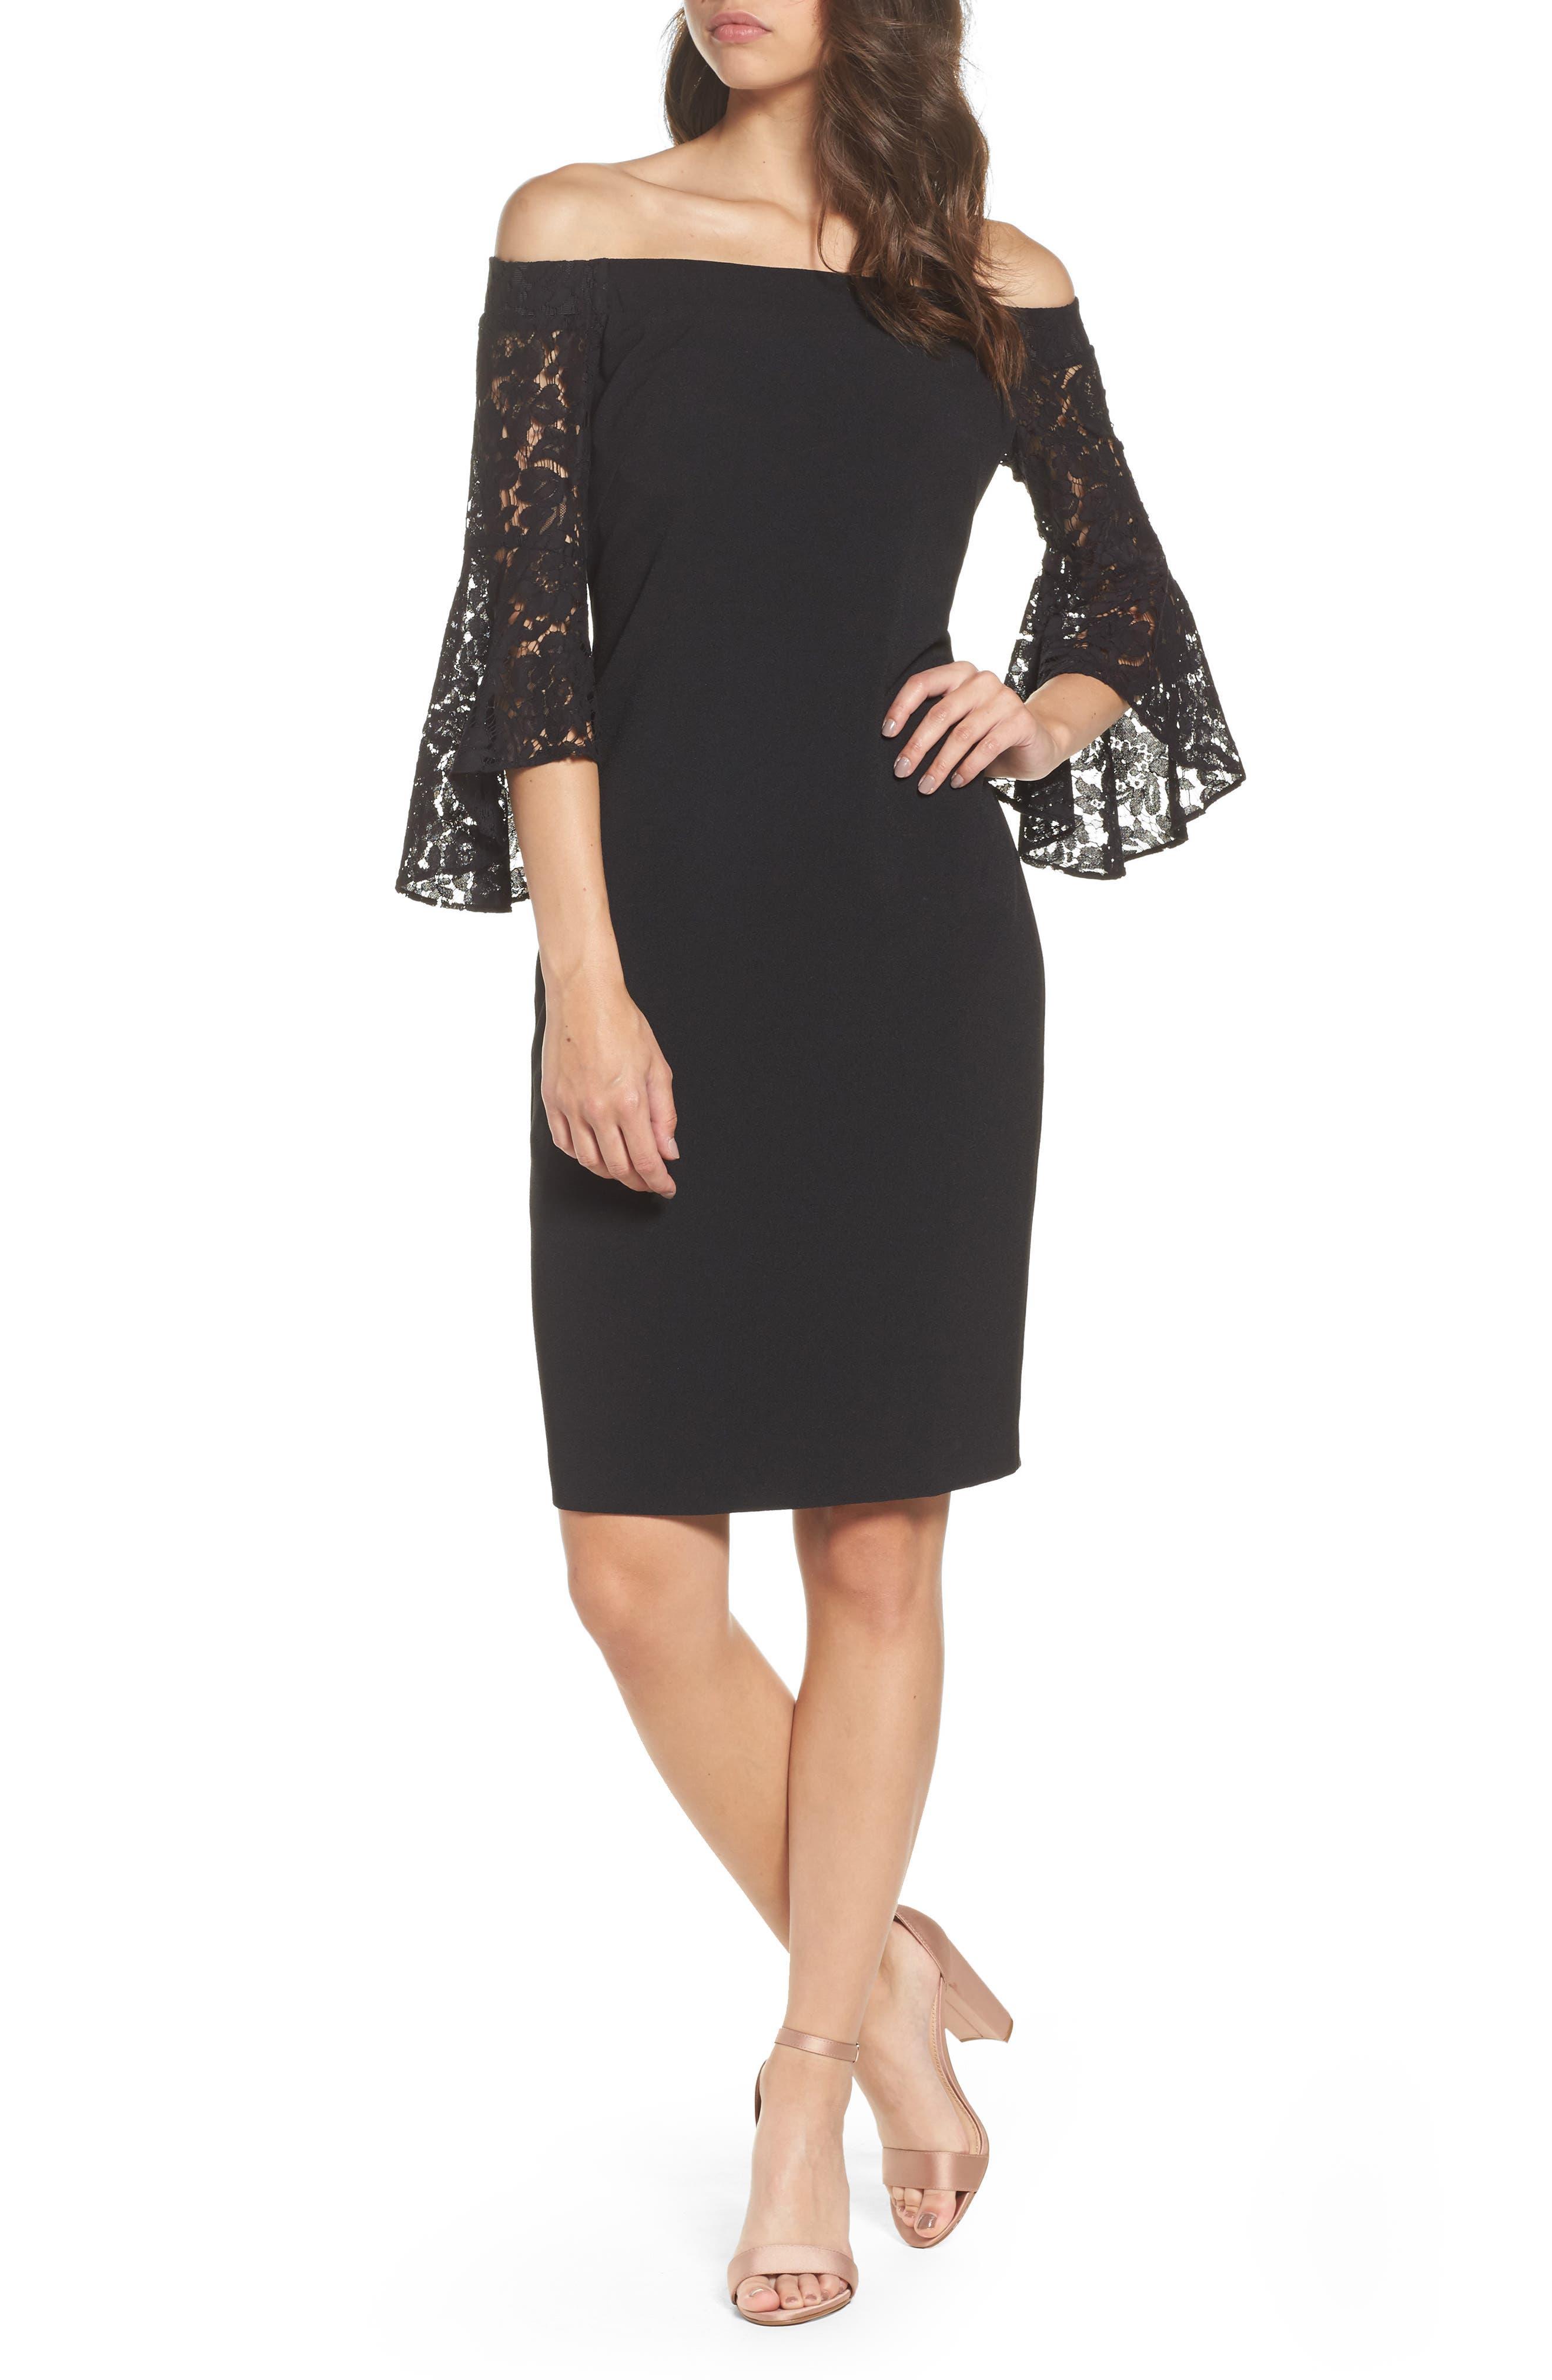 Chelsea28 Off the Shoulder Lace Dress